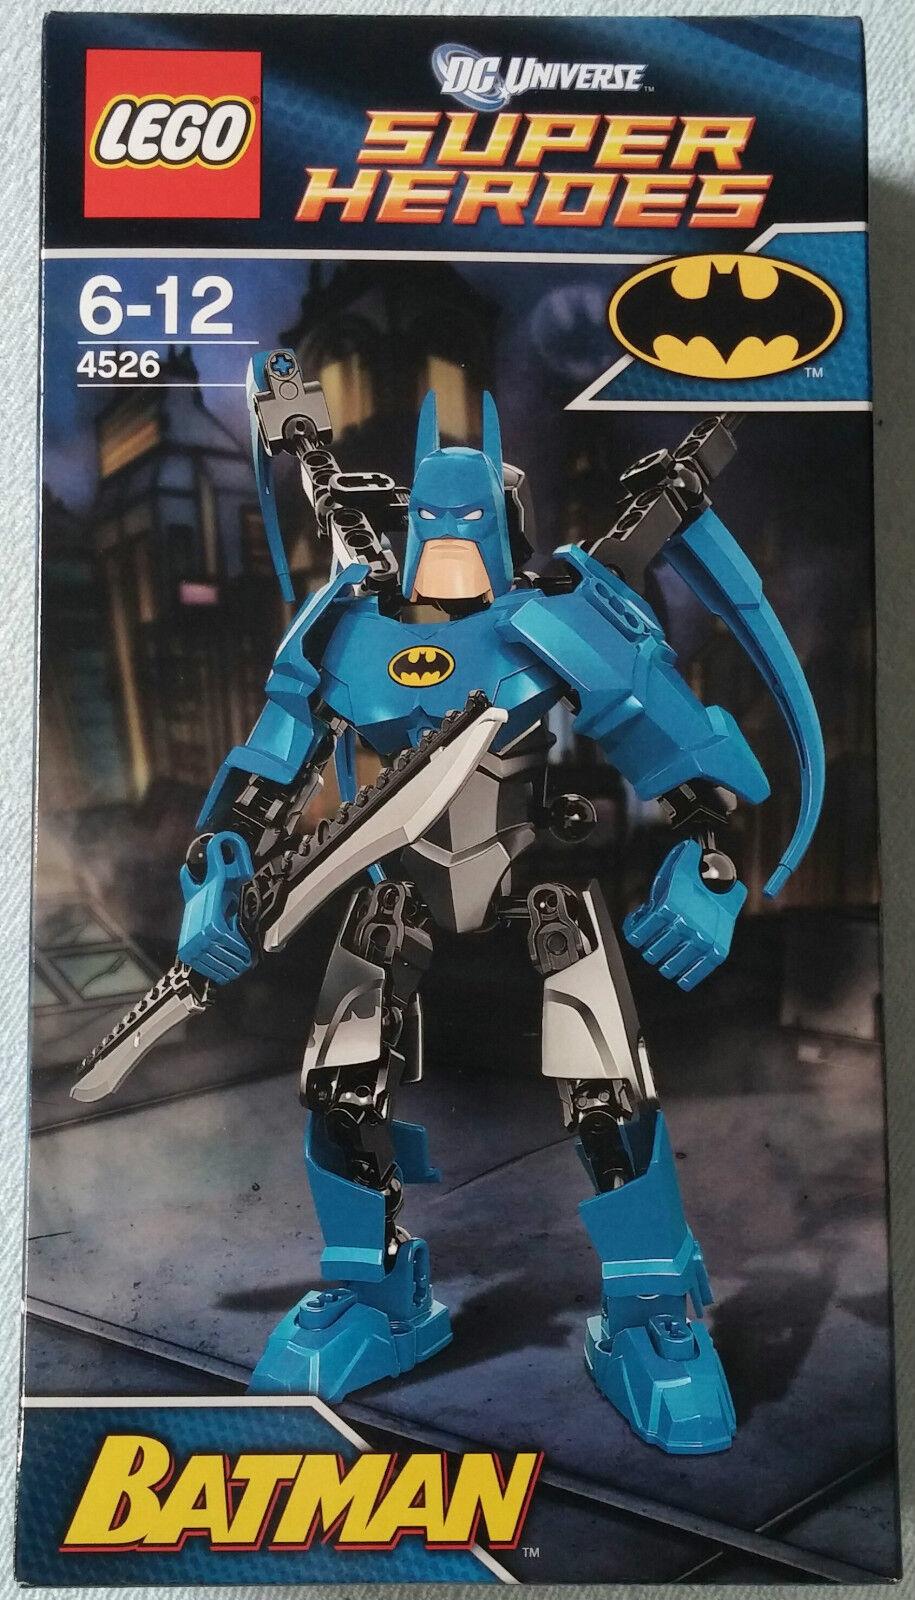 LEGO ® DC SUPER HEROES 4526 Batman ™ ultrabuild FIGURE NUOVO & OVP NEW SEALED